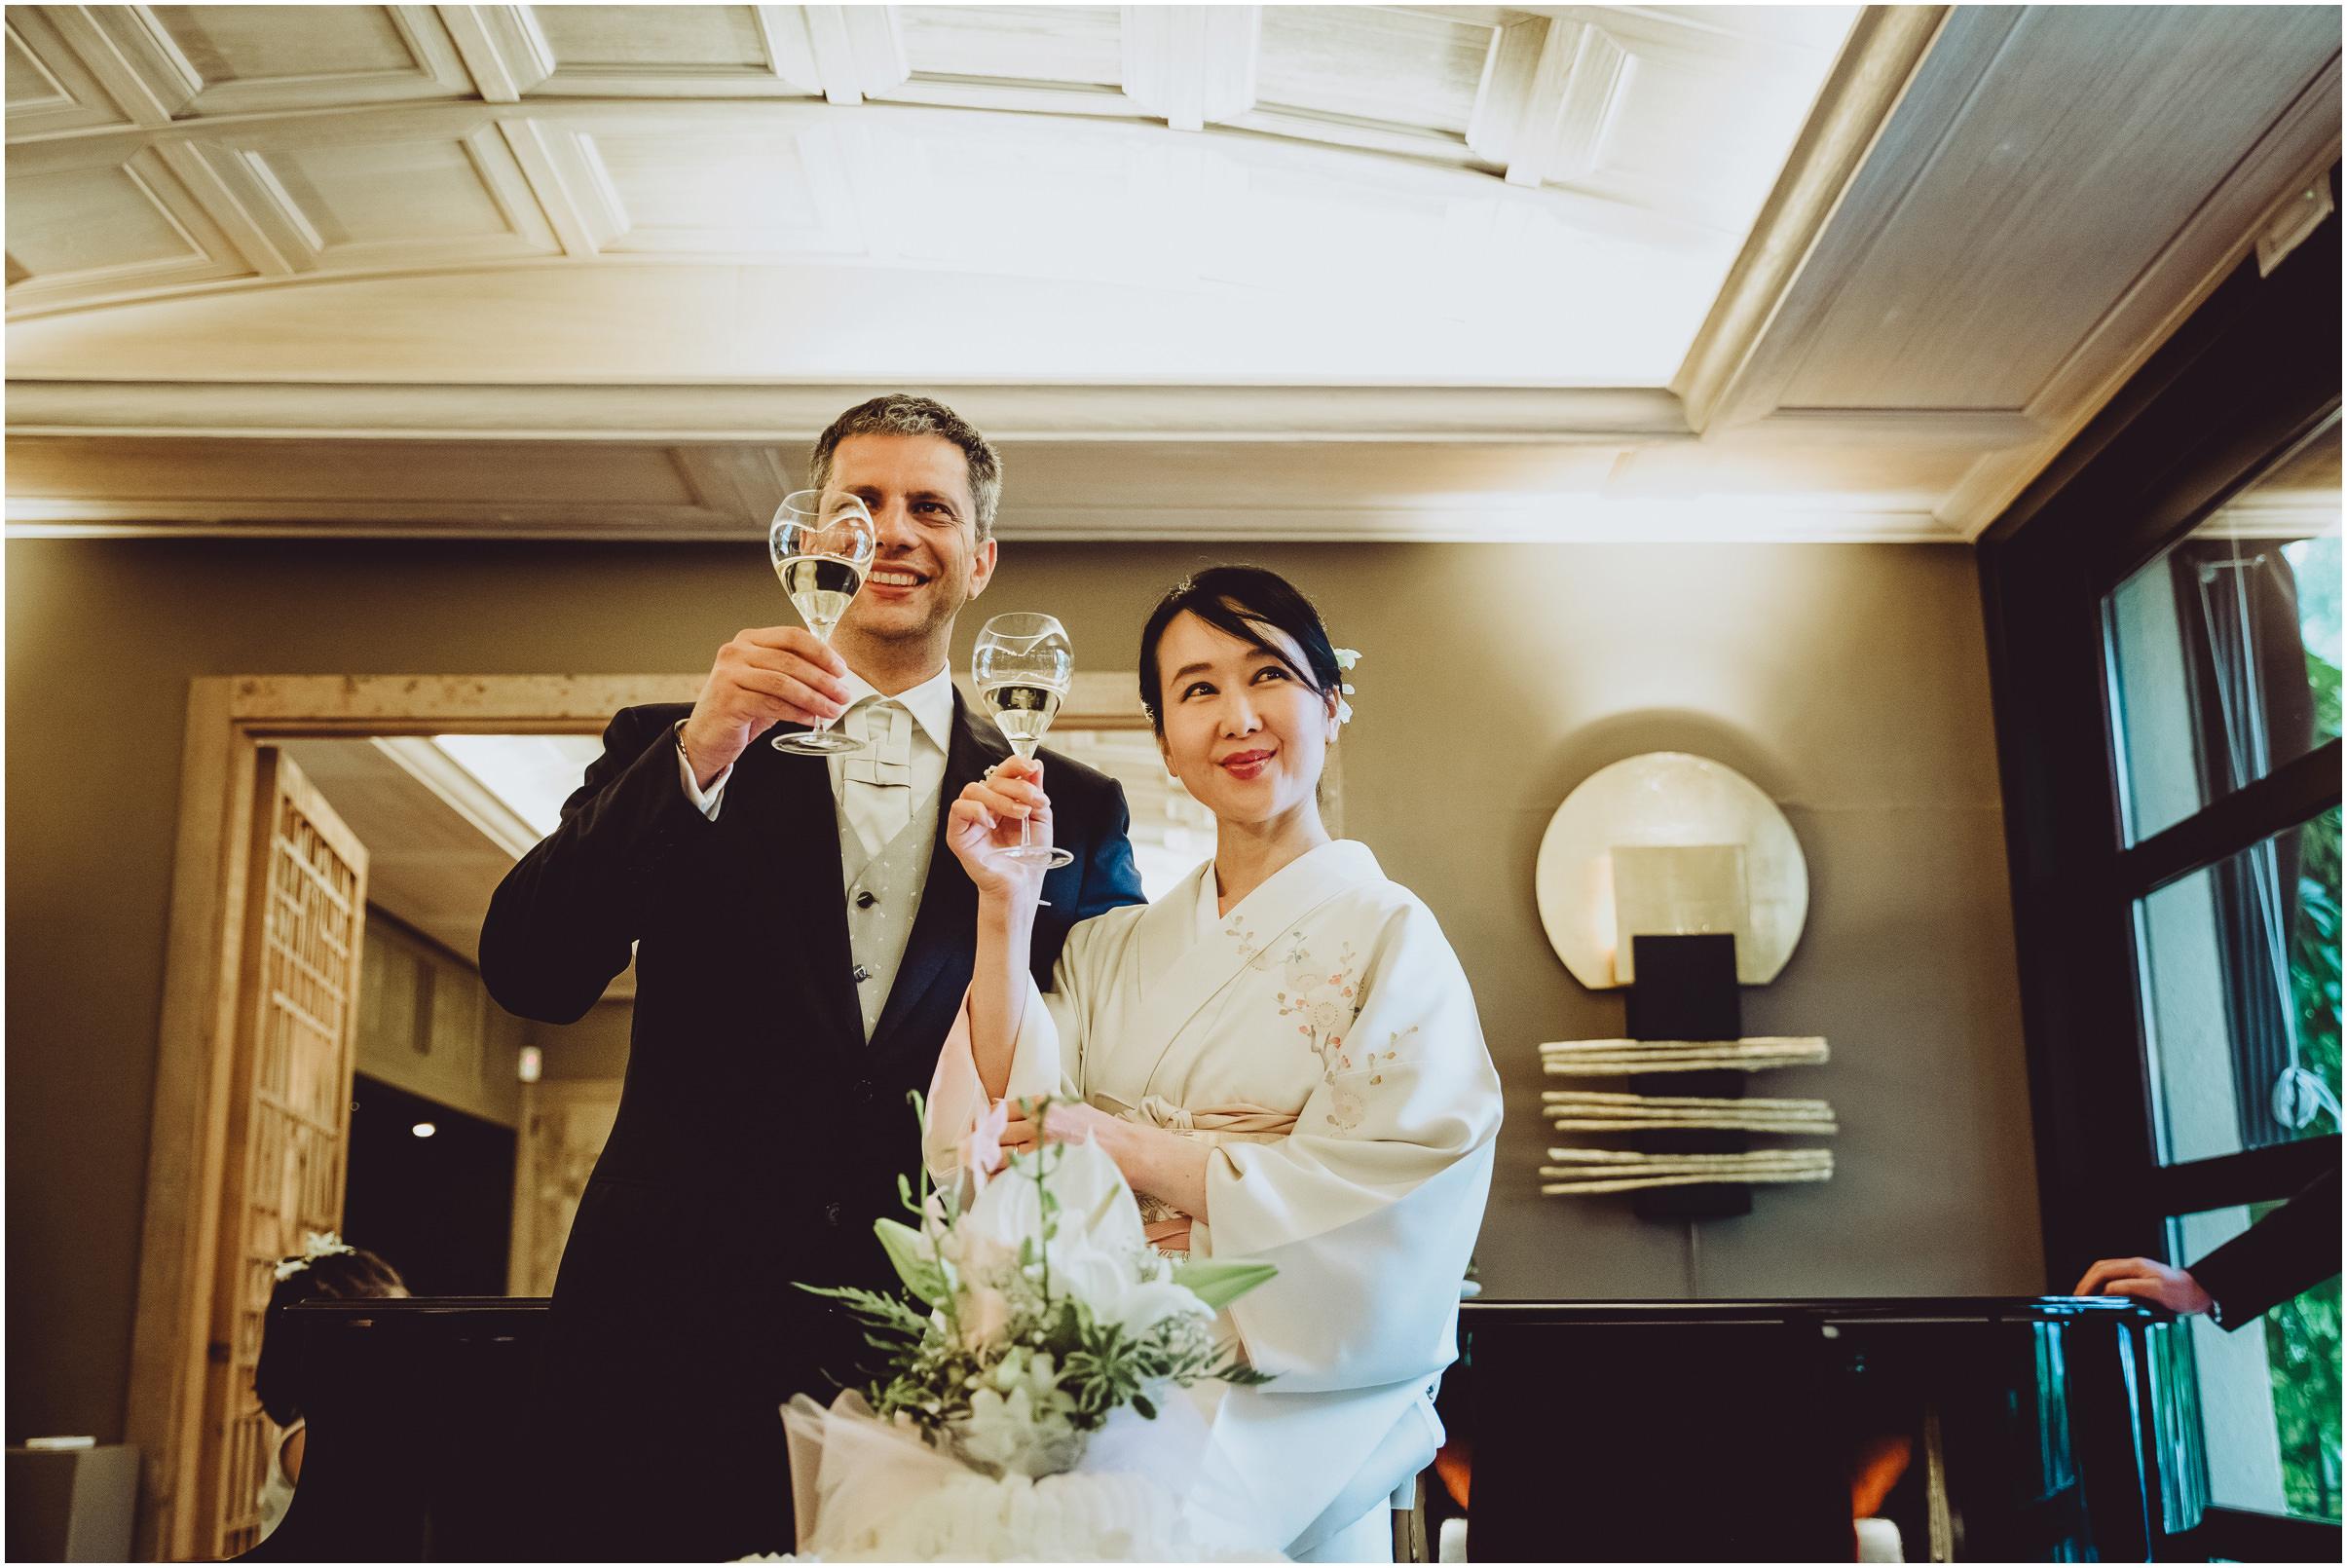 WEDDING-PHOTOGRAPHY-SARA-LORENZONI-FOTOGRAFIA-MATRIMONIO-ORVIETO-JUKA-ANTONELLO63